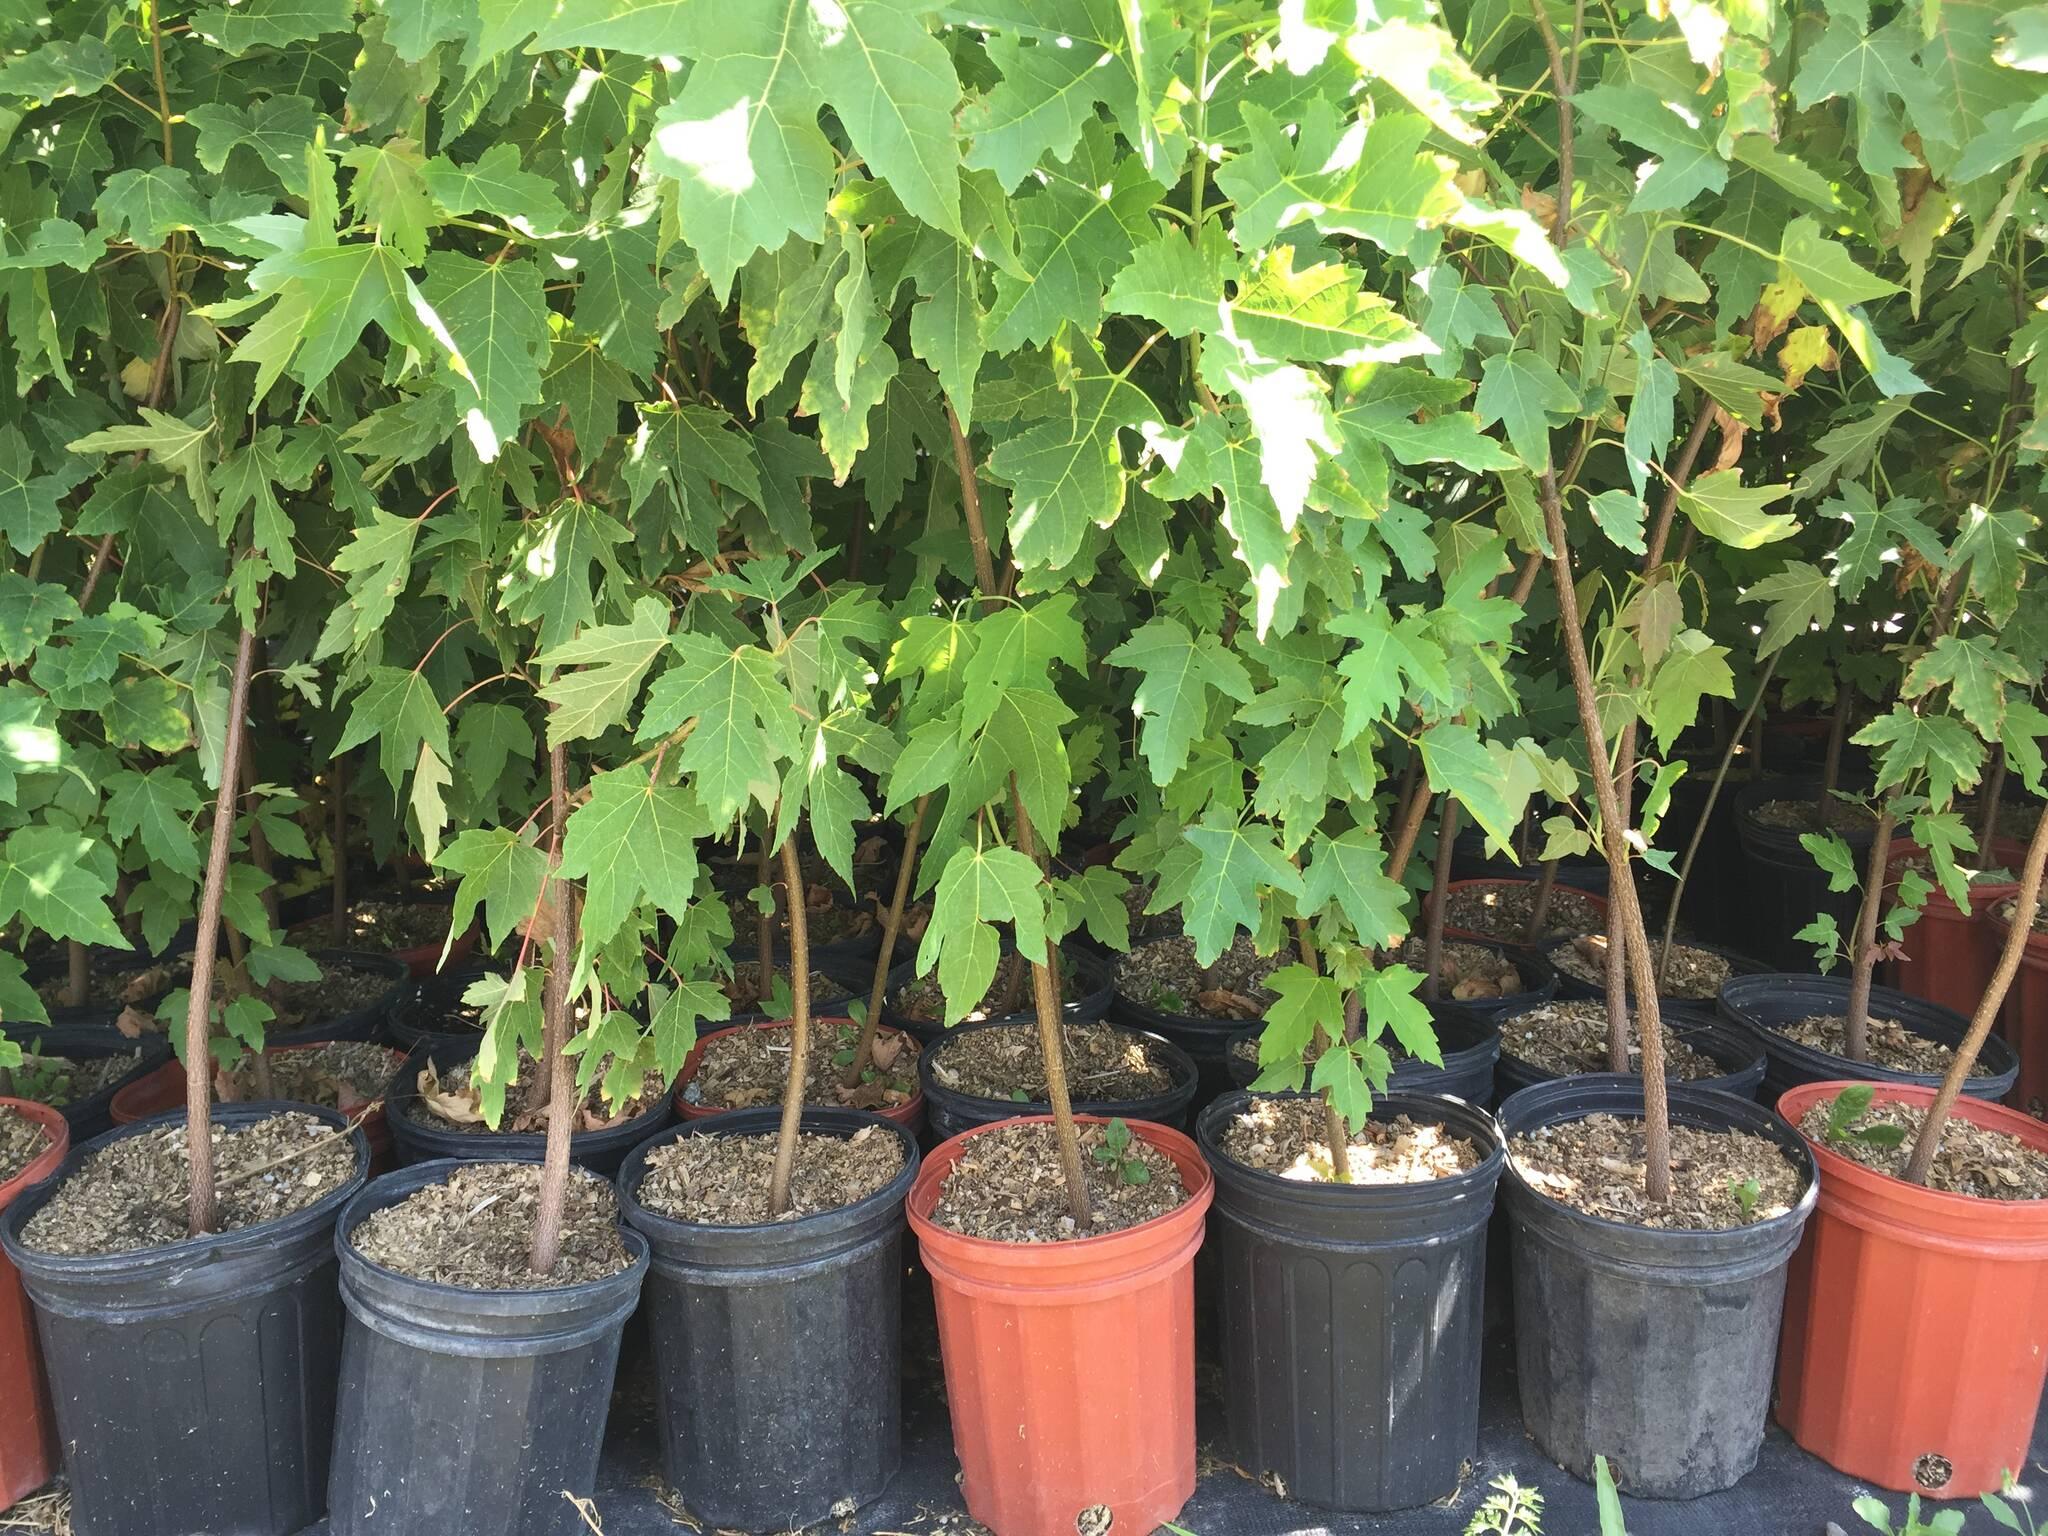 Elspeth Heyworth Centre For Women Hosts Tree Me